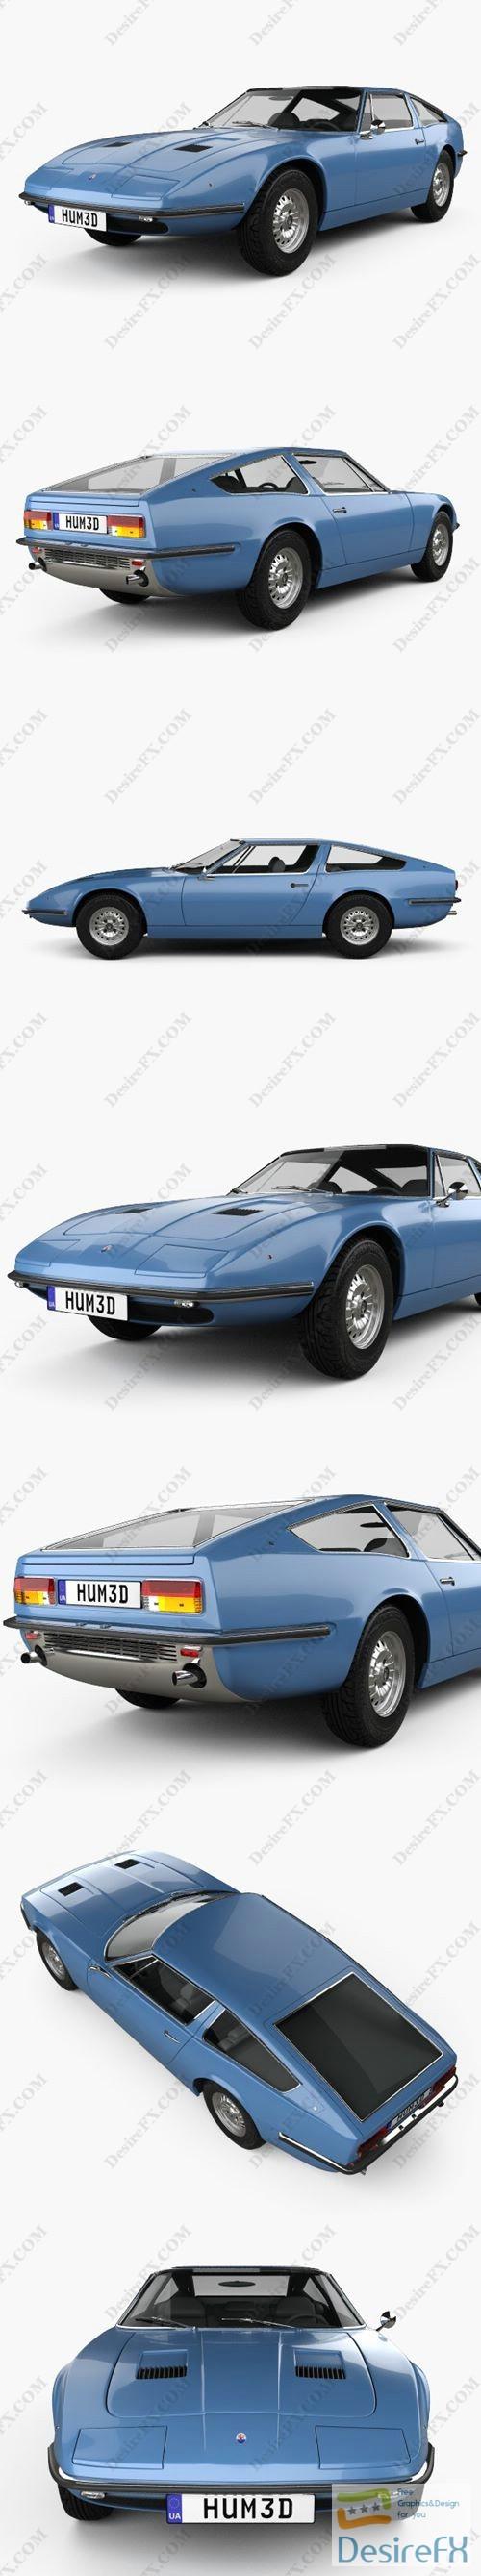 Maserati Indy 1969 3D Model